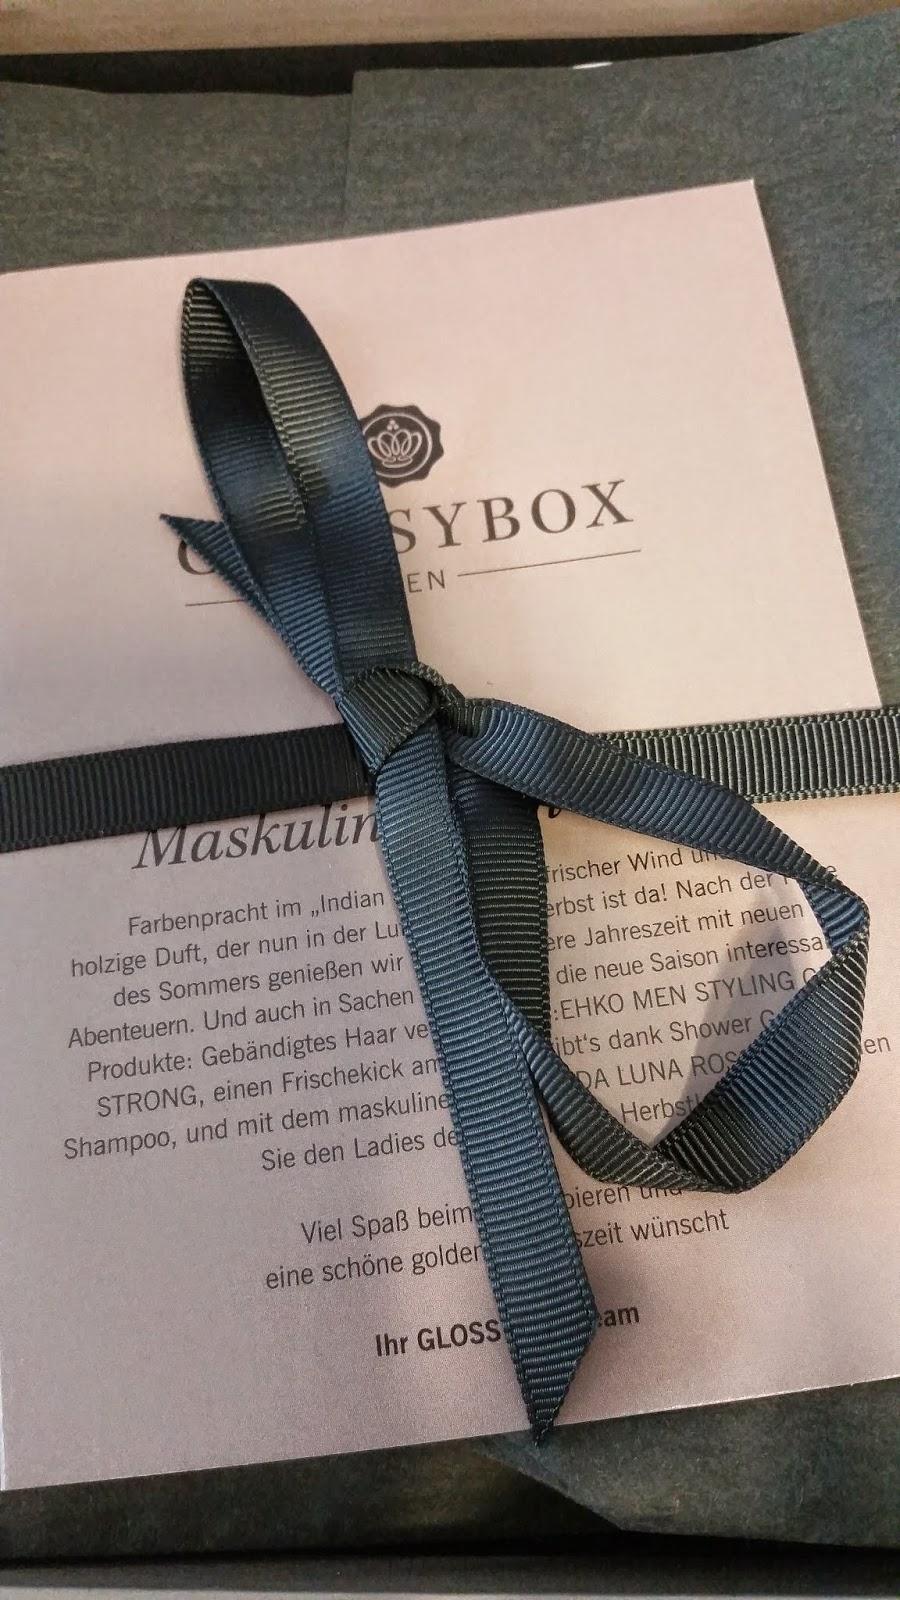 Glossy Box Men - Maskulin in den Herbst - www.annitschkasblog.de